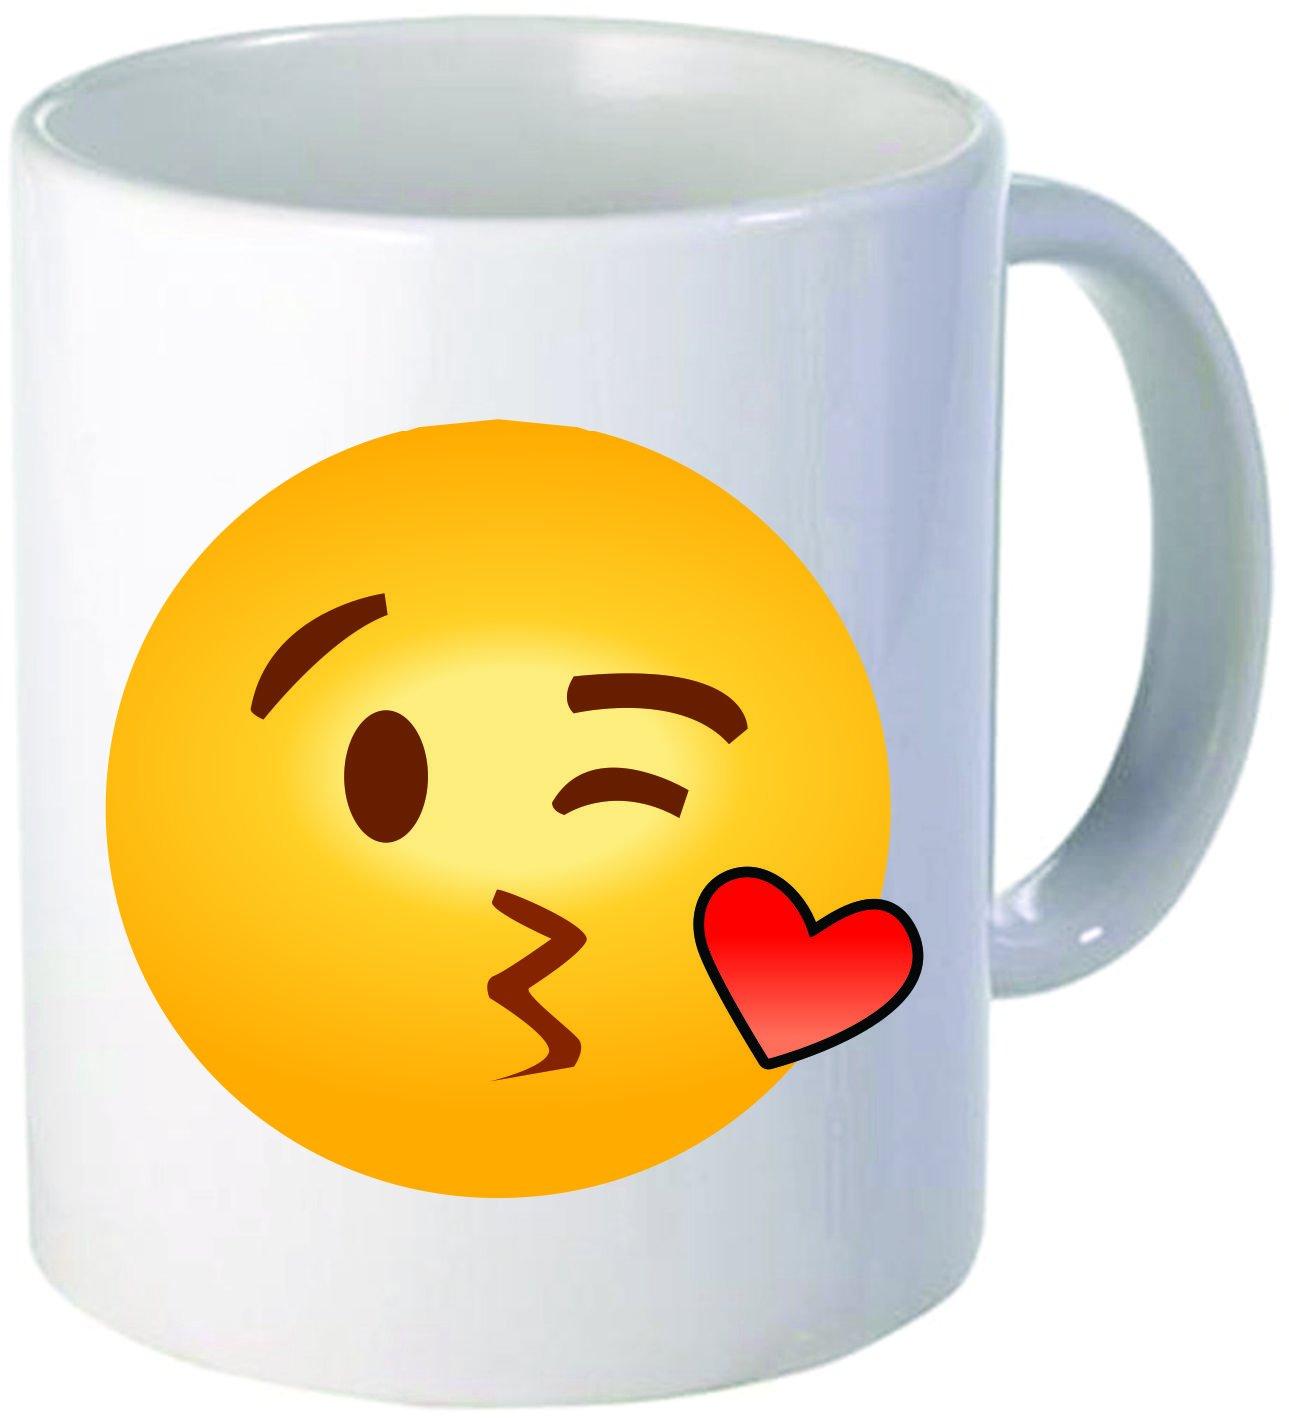 Smiley Face Coffee Mug Amazoncom Funny Coffee Mug 11oz Ceramic Emoji Throwing A